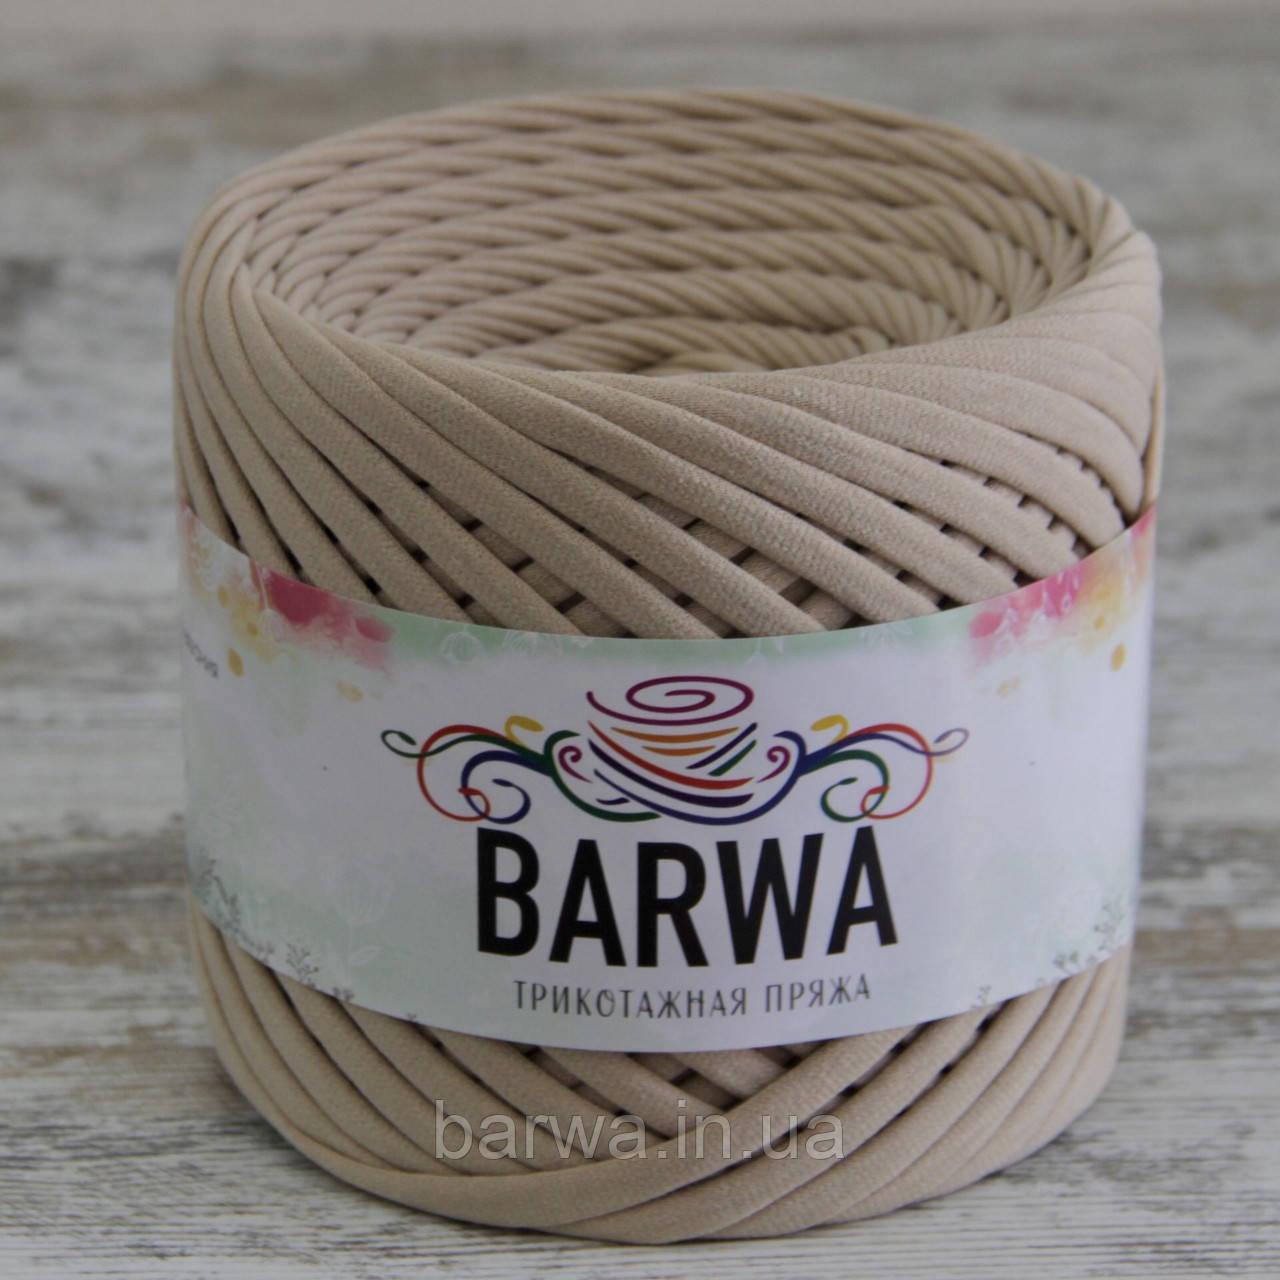 Трикотажная пряжа BARWA light 5-7 мм, Имбирь (ginger)